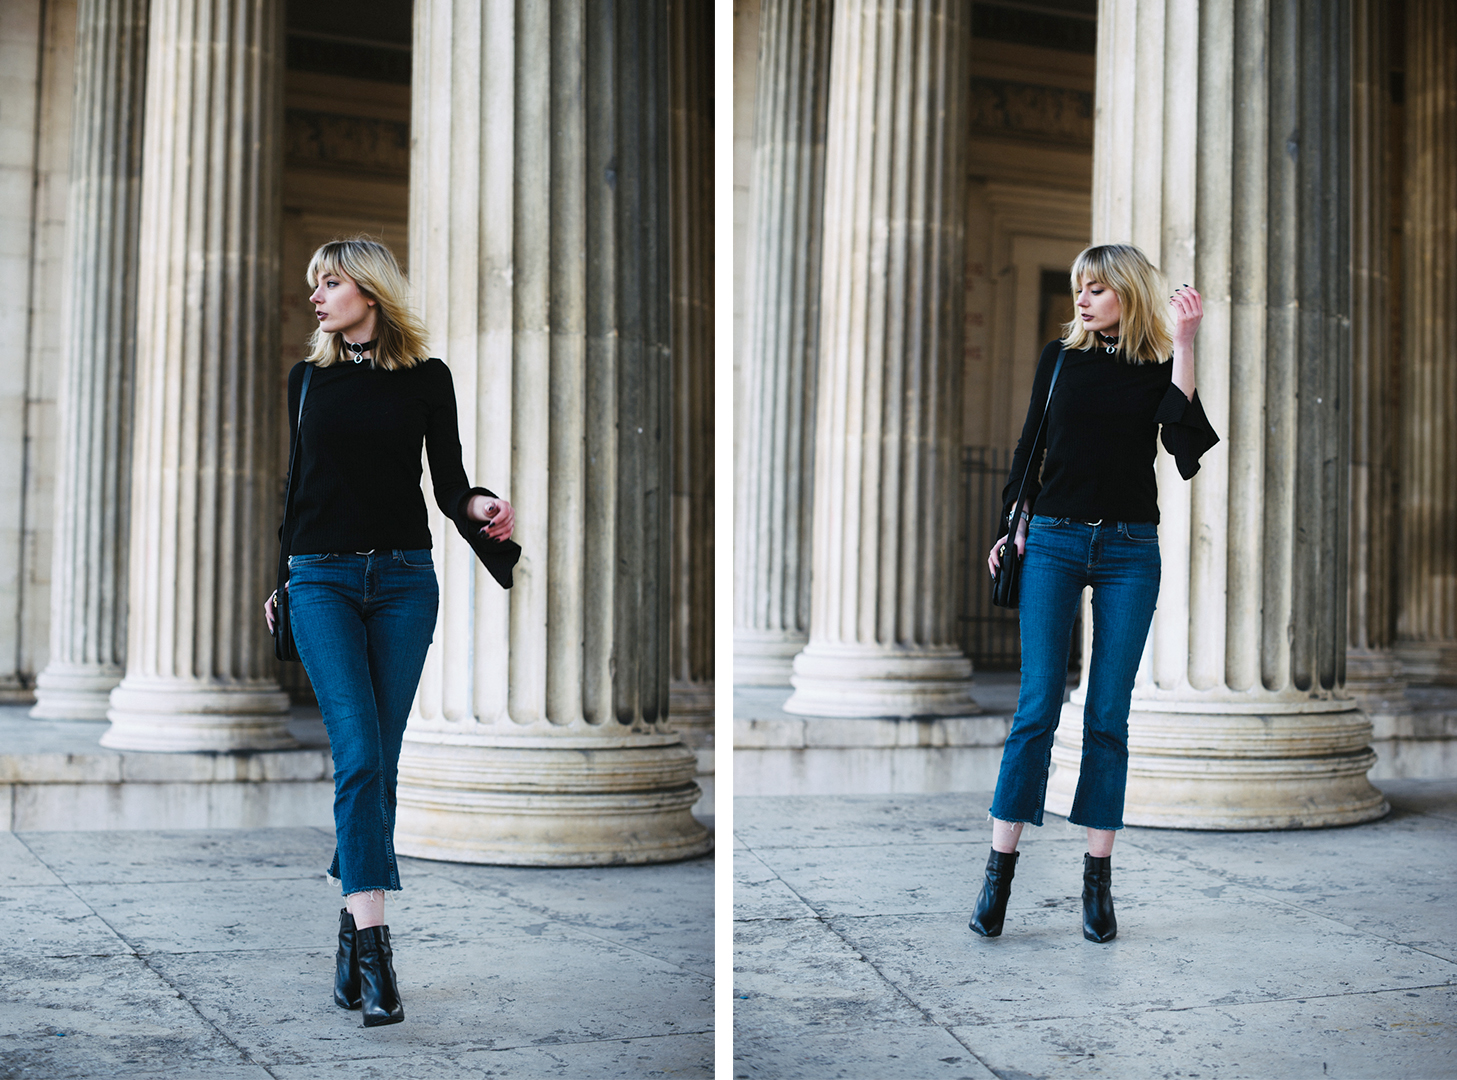 Kiamisu_Modeblog_Fashionblog_Beautyblog_Leo Mantel_Zara_Leo Mantel kombinieren-collage